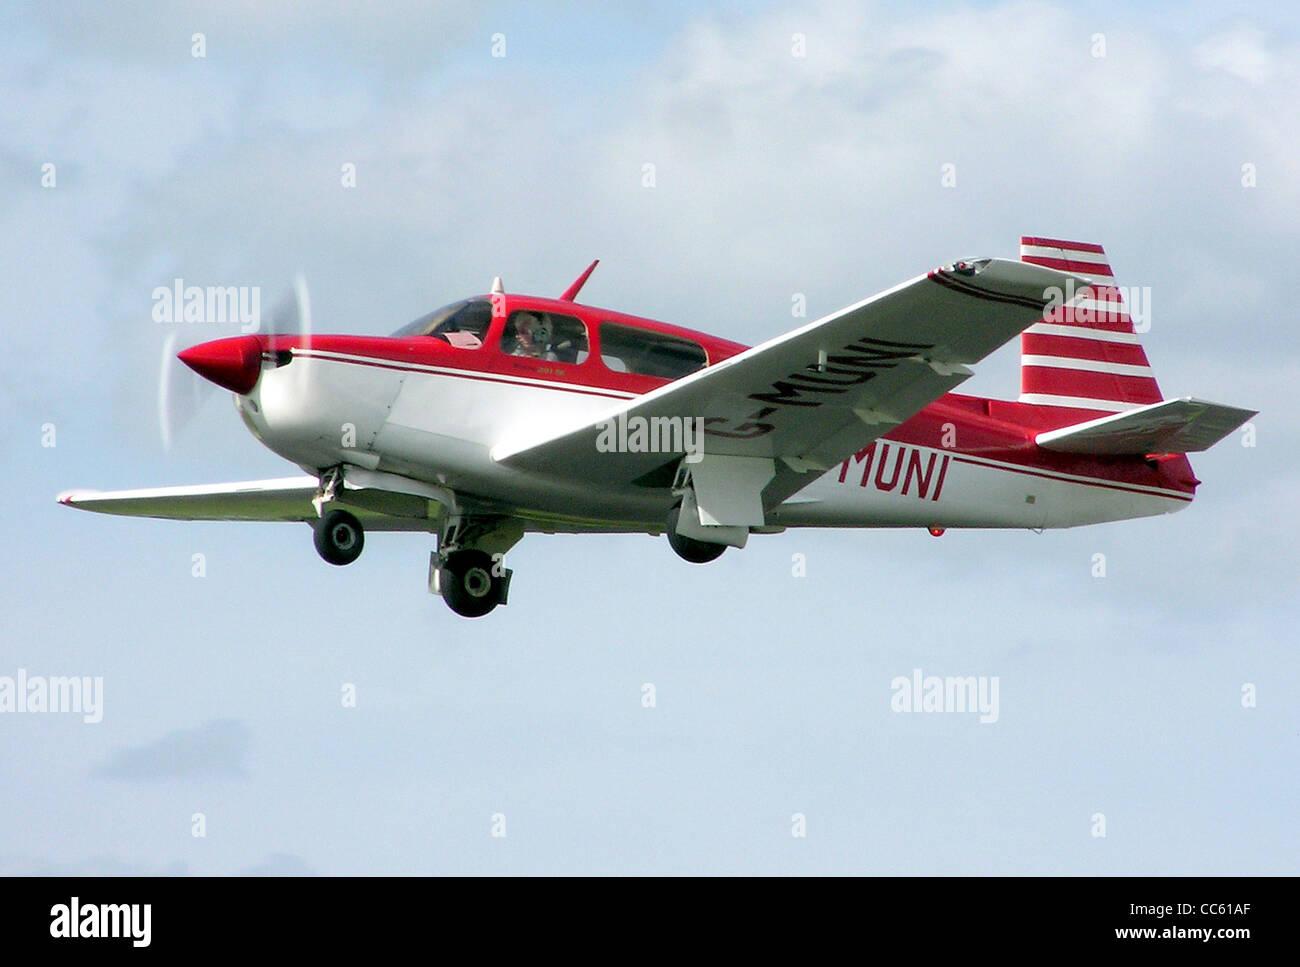 Mooney M20J (UK Registrierung G-MUNI, Datum der Build 1989) am Flugplatz Kemble, Gloucestershire, England. Stockbild